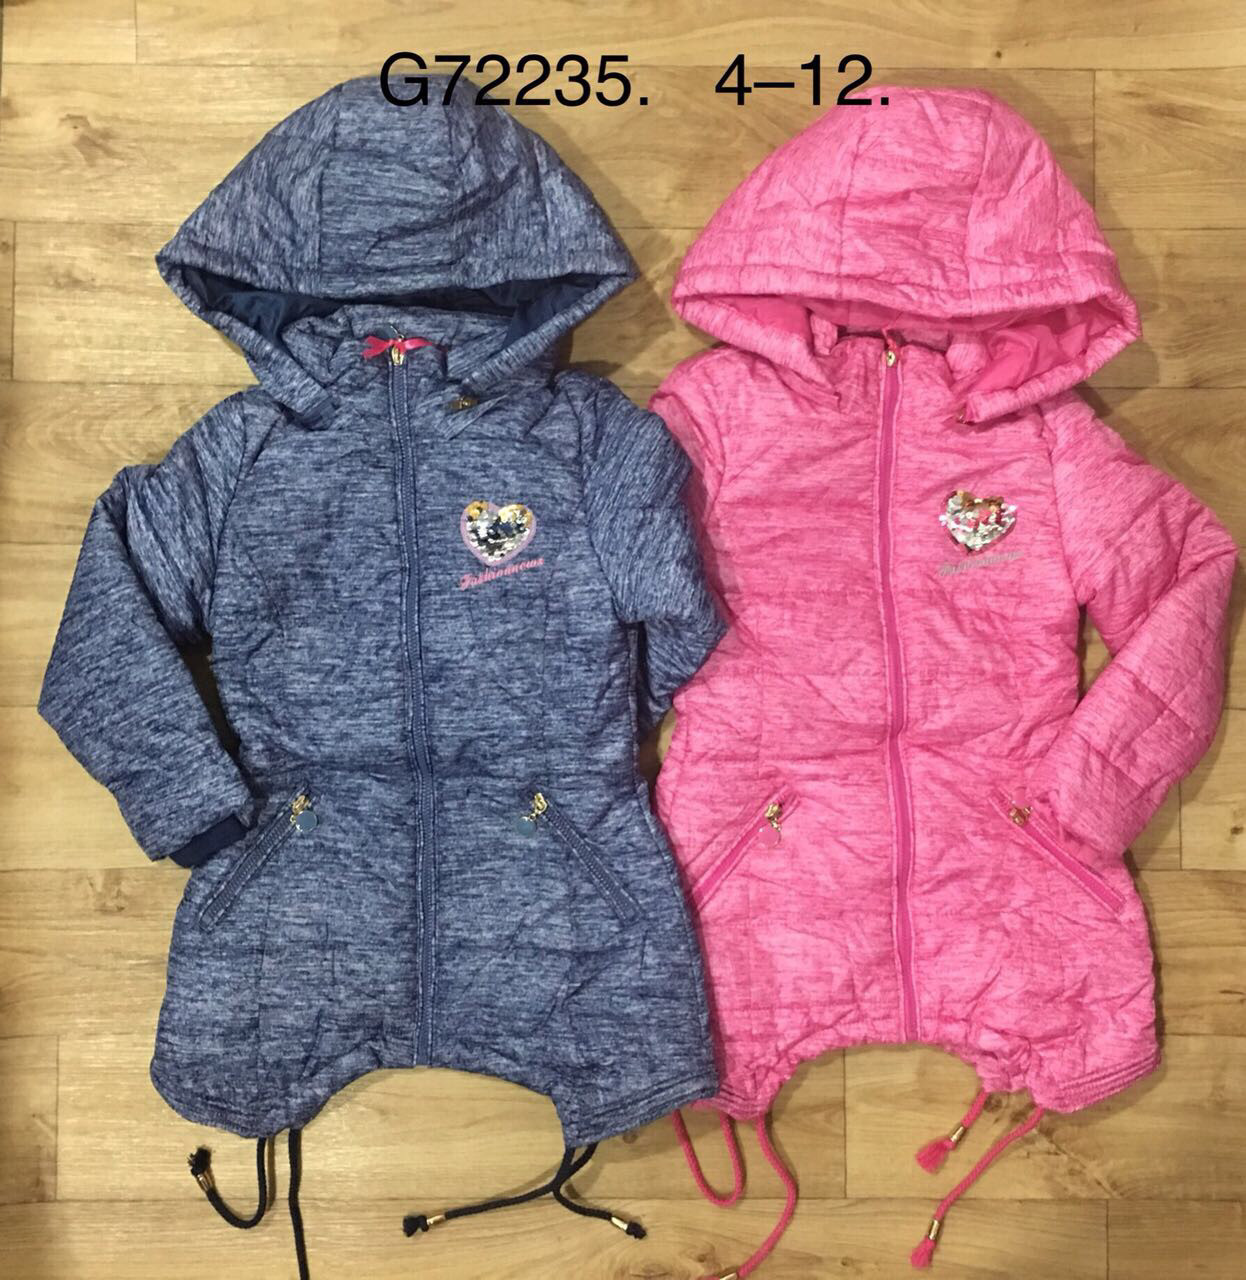 f3787009a1fa Куртка для девочек оптом,Grace, 4-12 лет., арт.G72235  продажа, цена ...